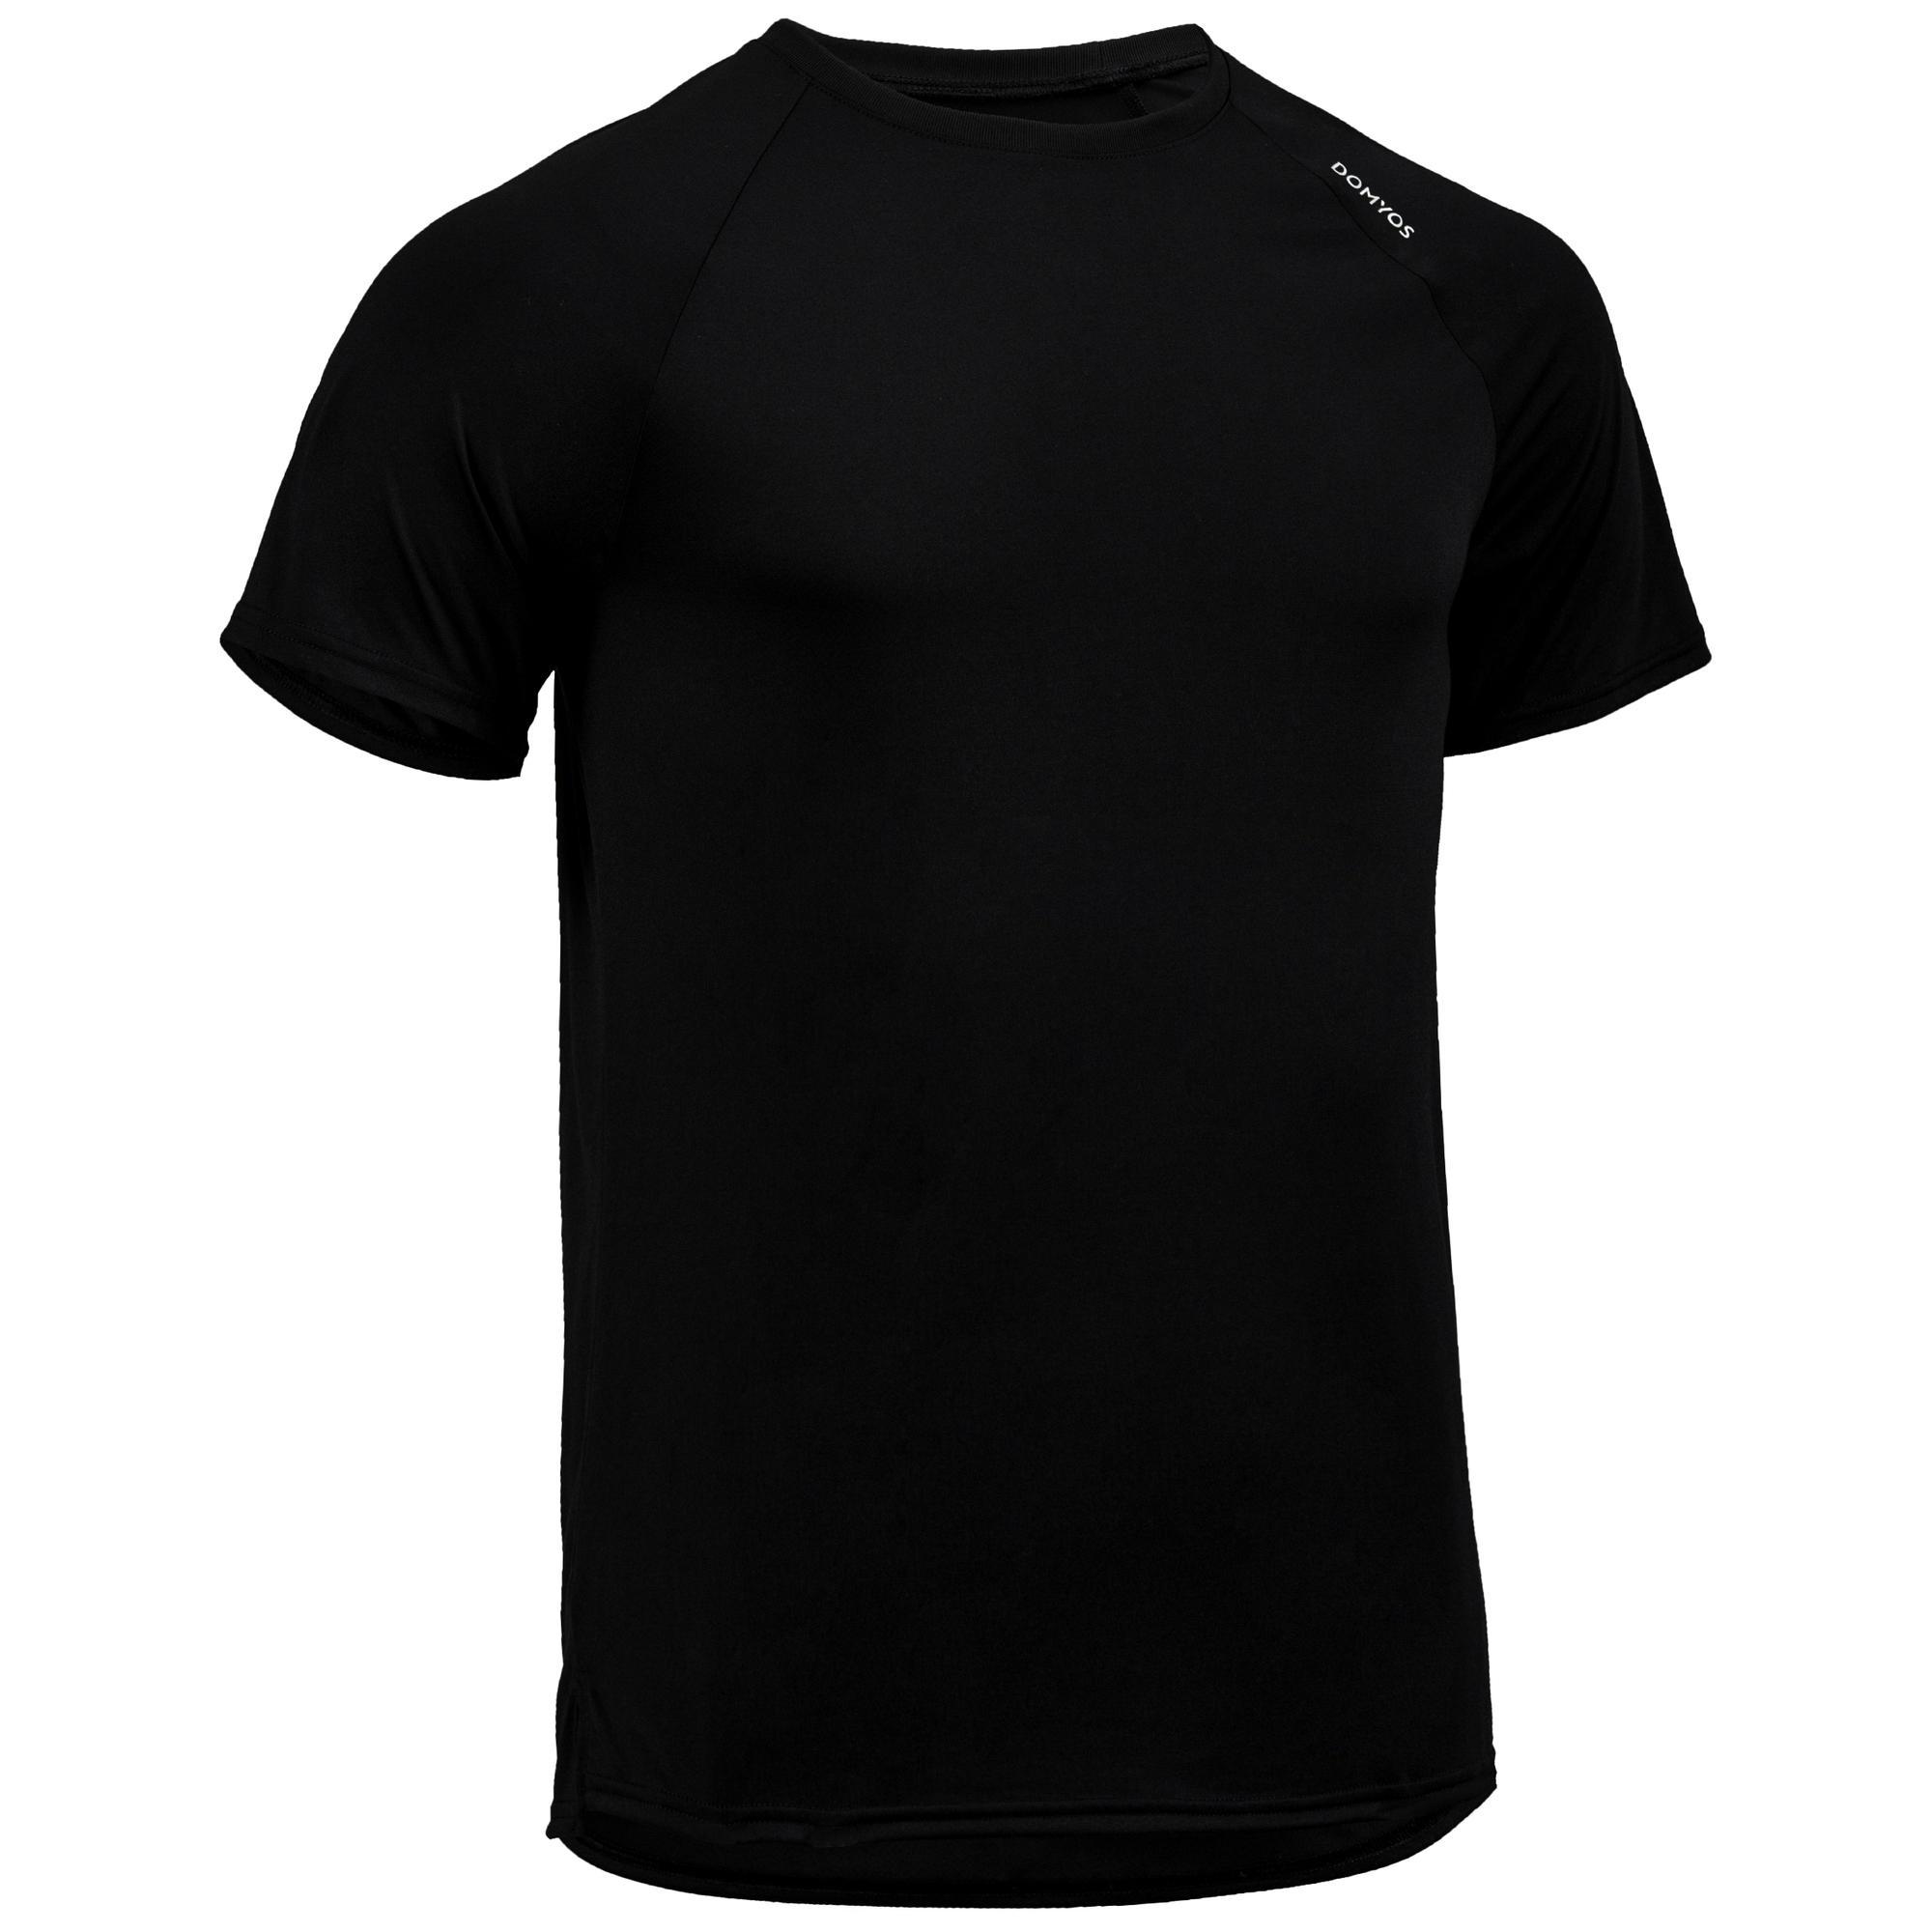 Tee shirt belgique decathlon